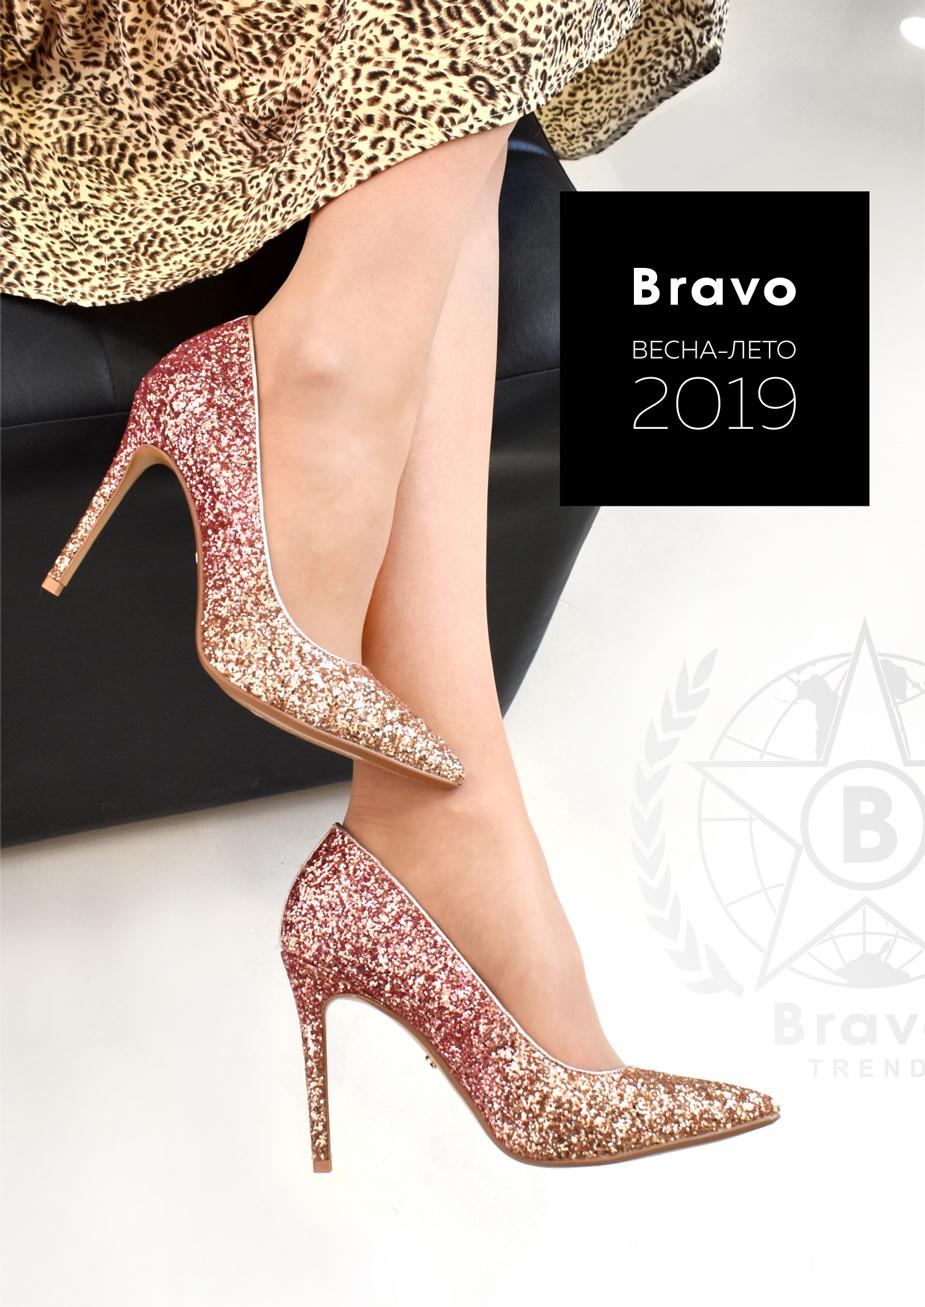 BRAVO Весна-Лето 2019